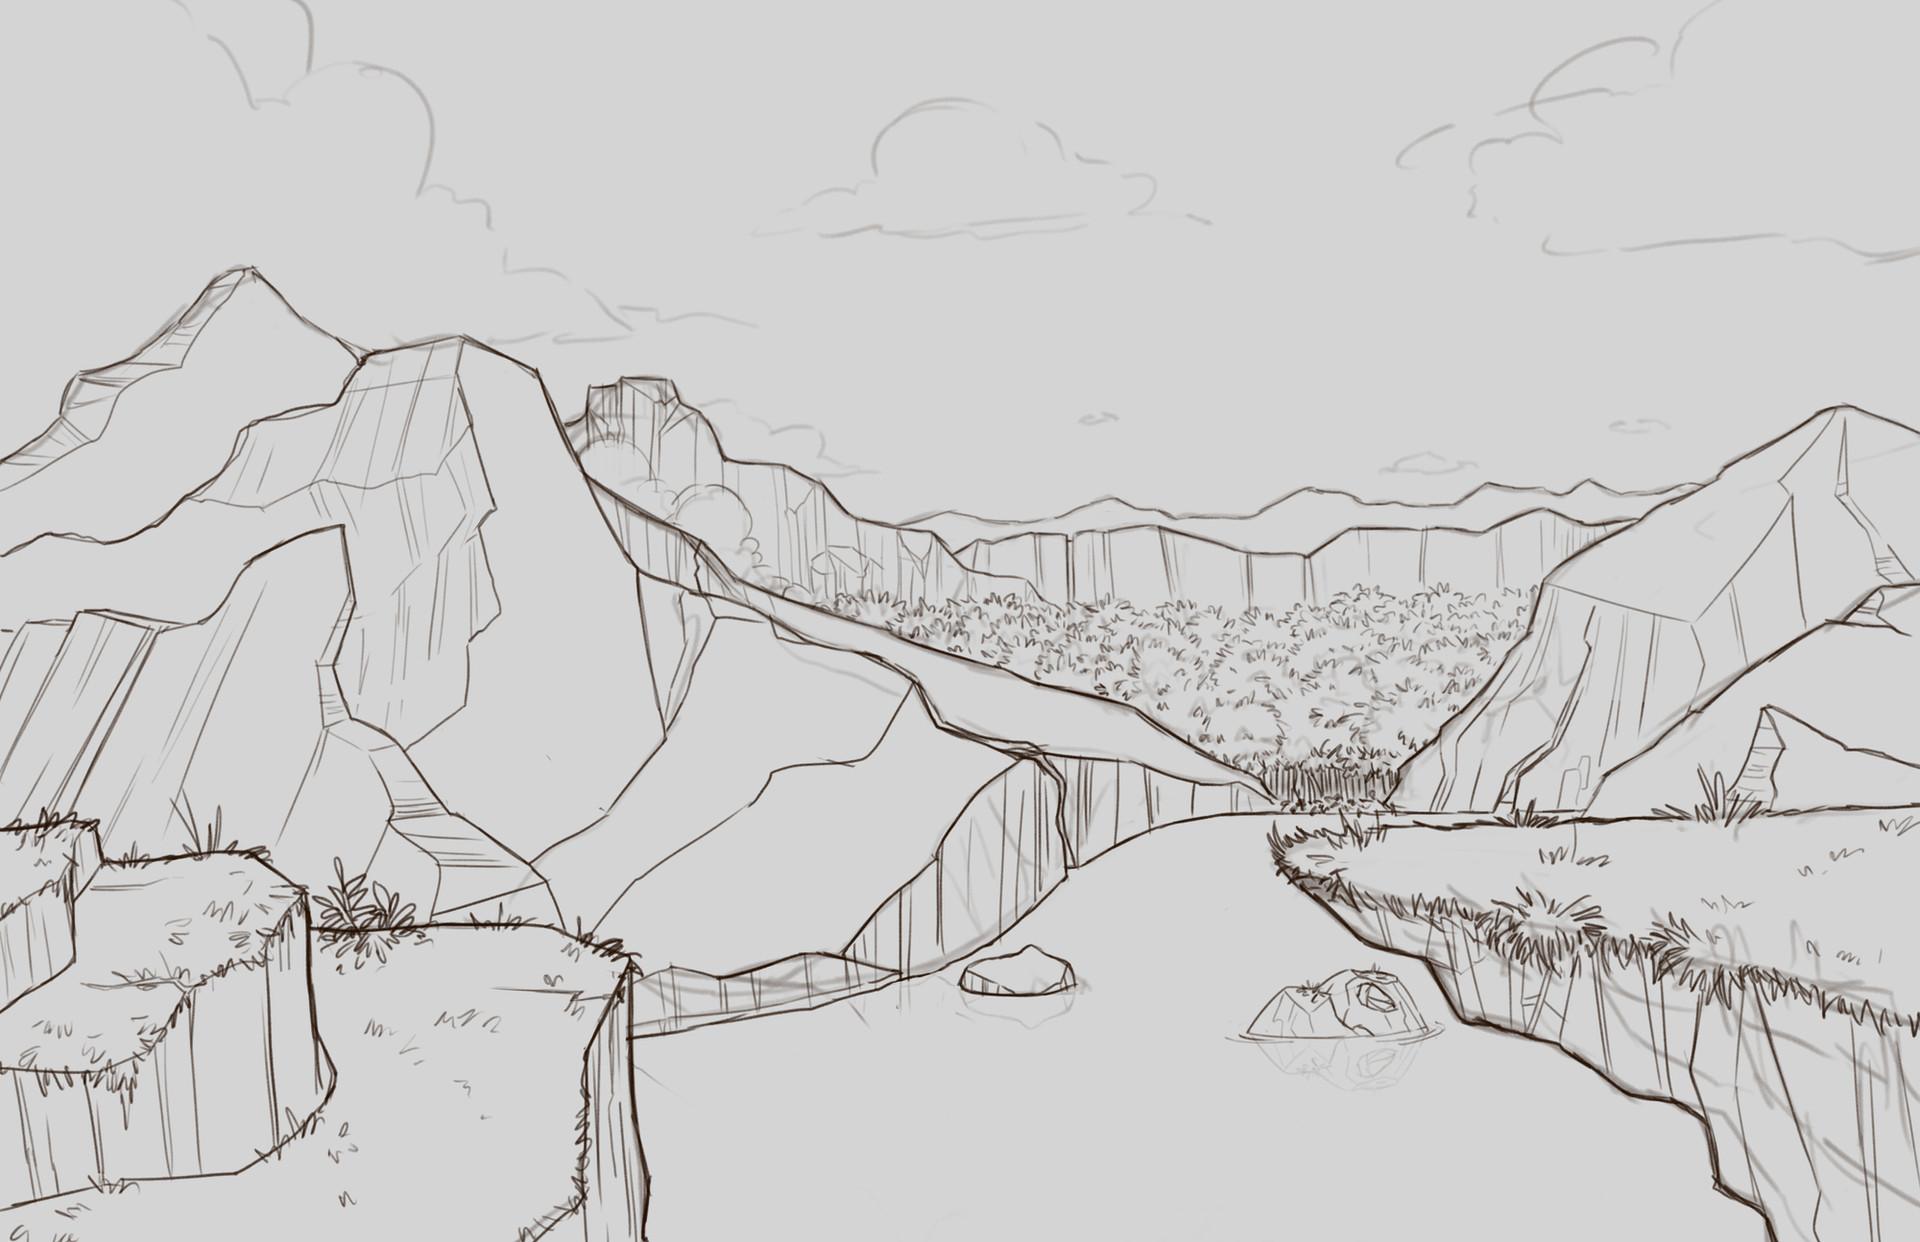 Crey Mountains sketch